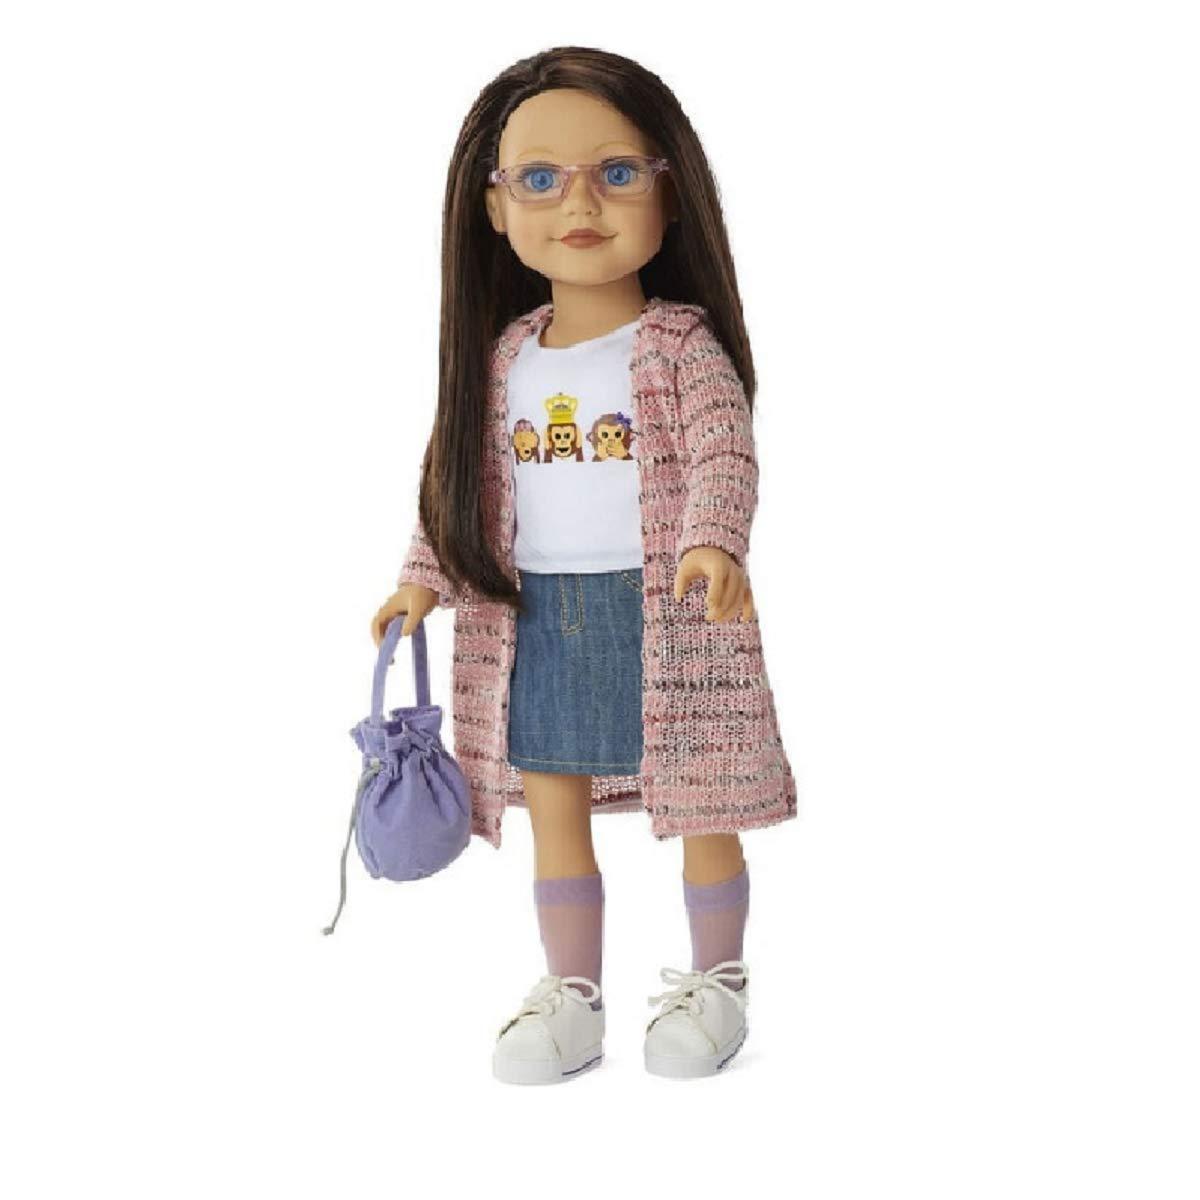 Journey Girls Dana 18 Doll with Denim Skirt and Pink Cardigan